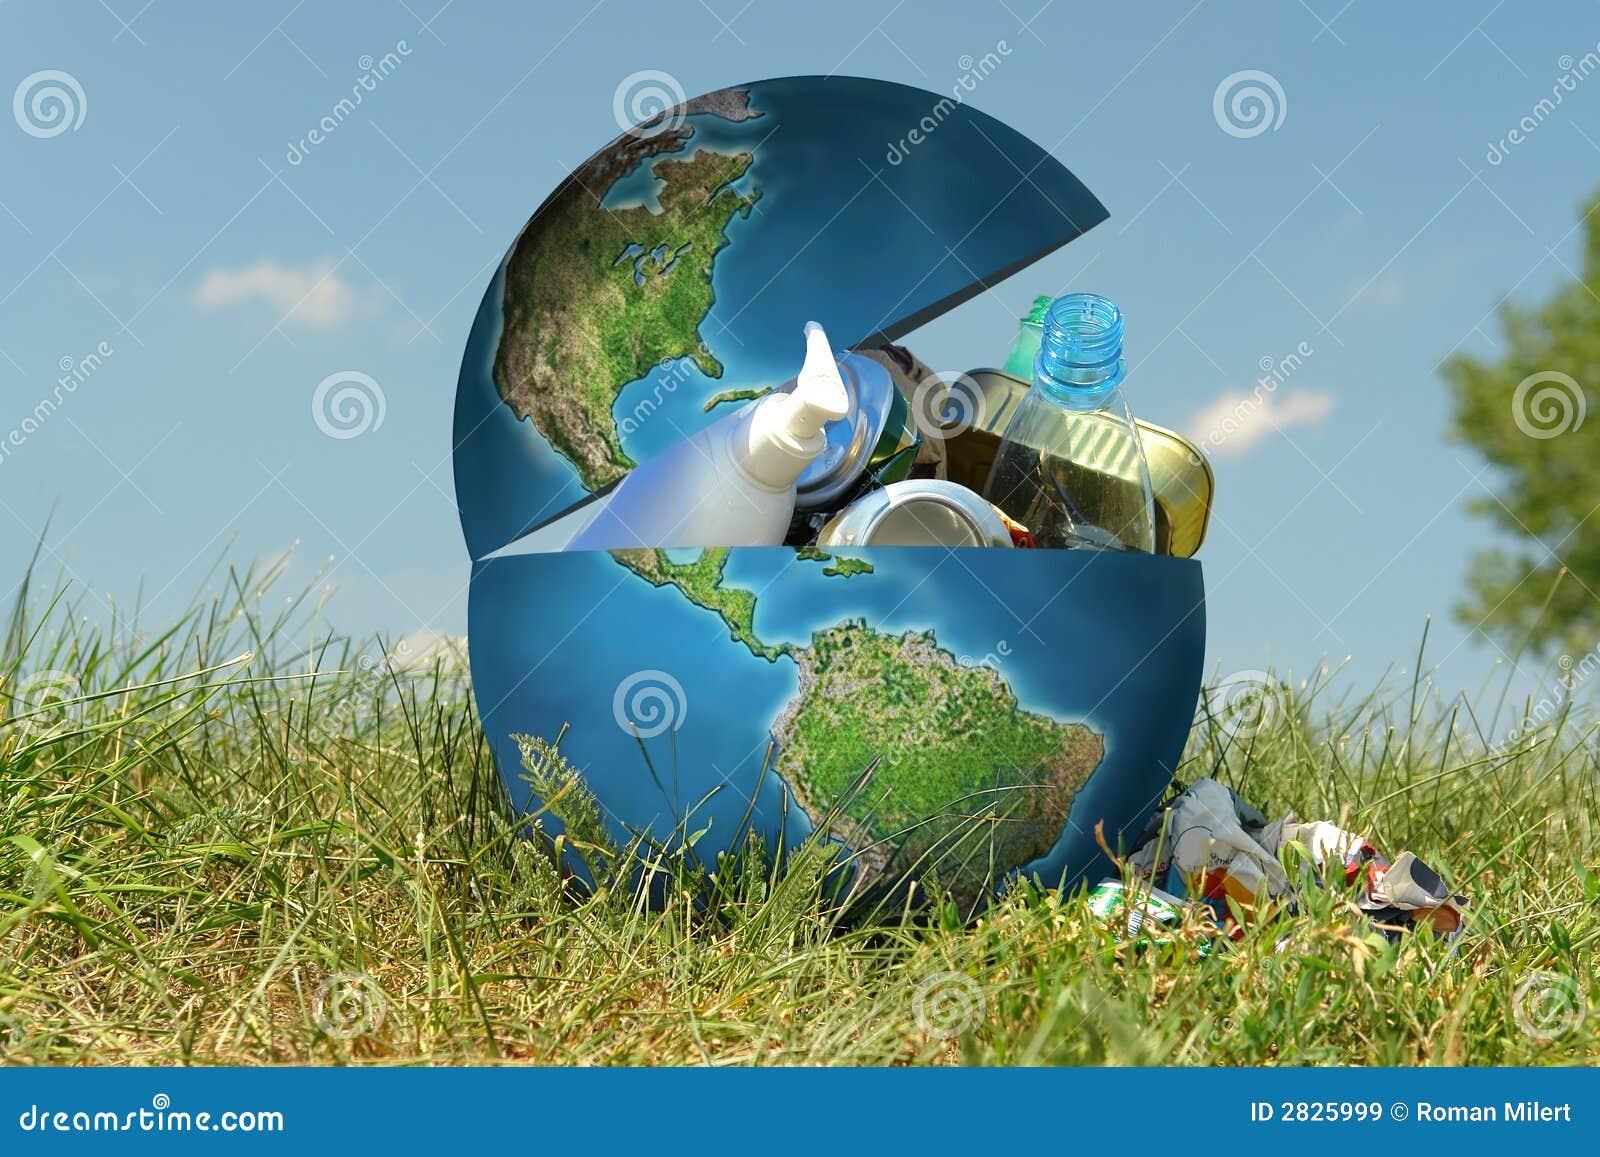 Future environment essay